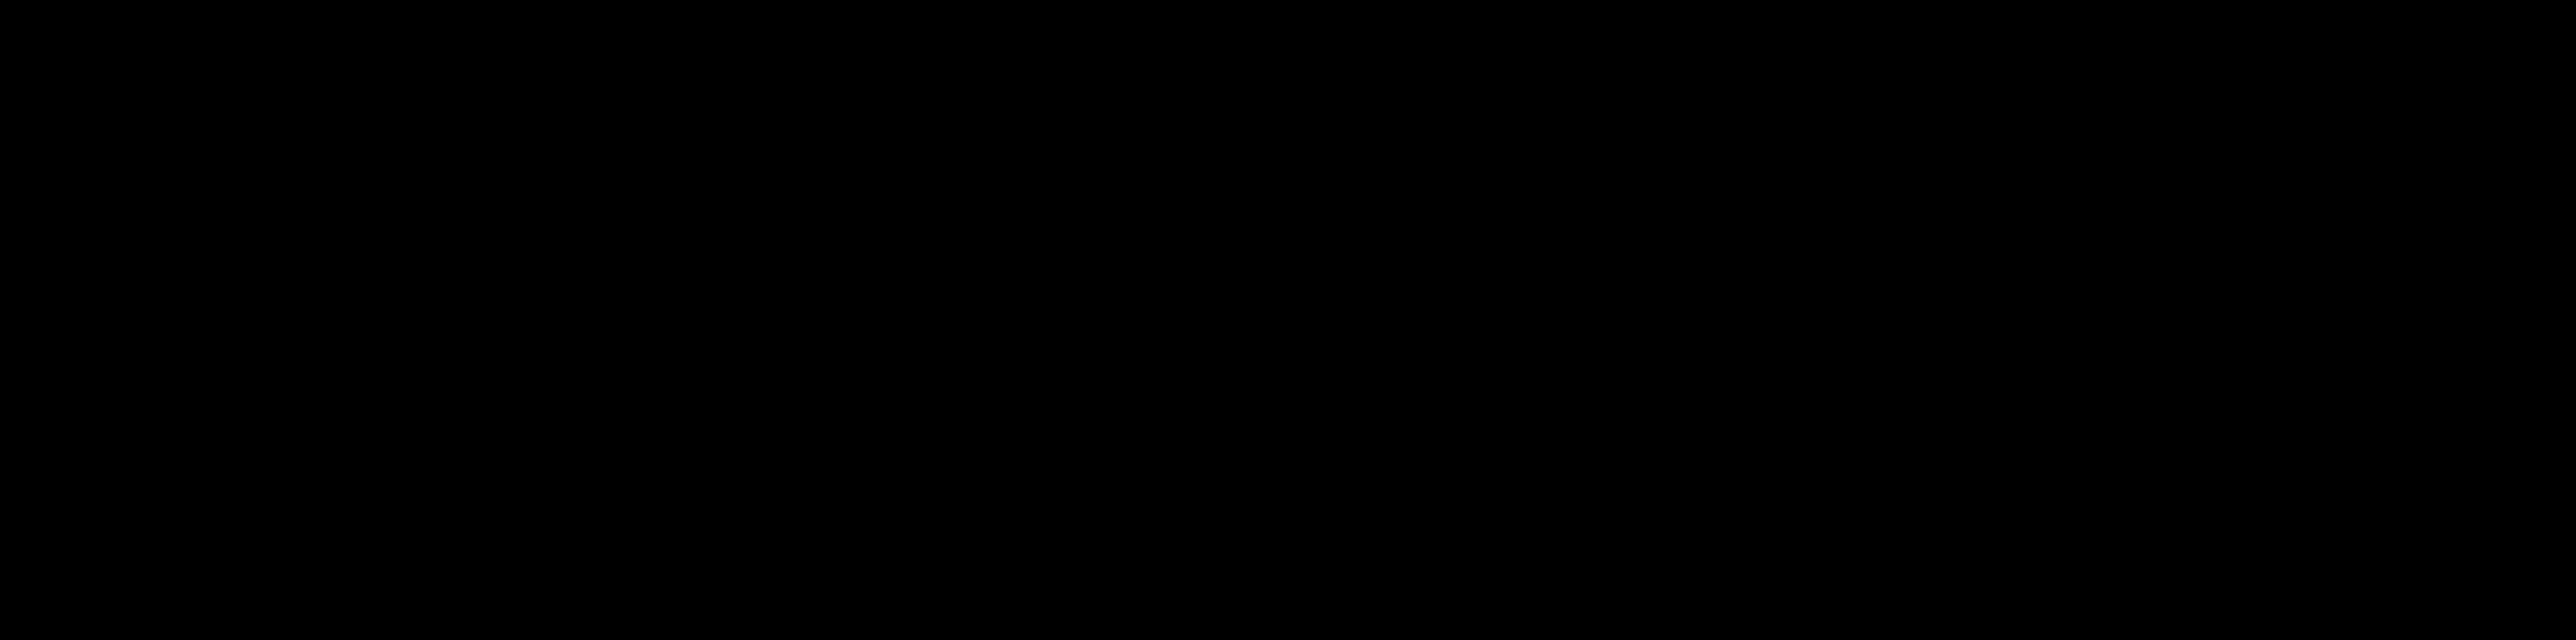 DulcieTaylor-Black-logo